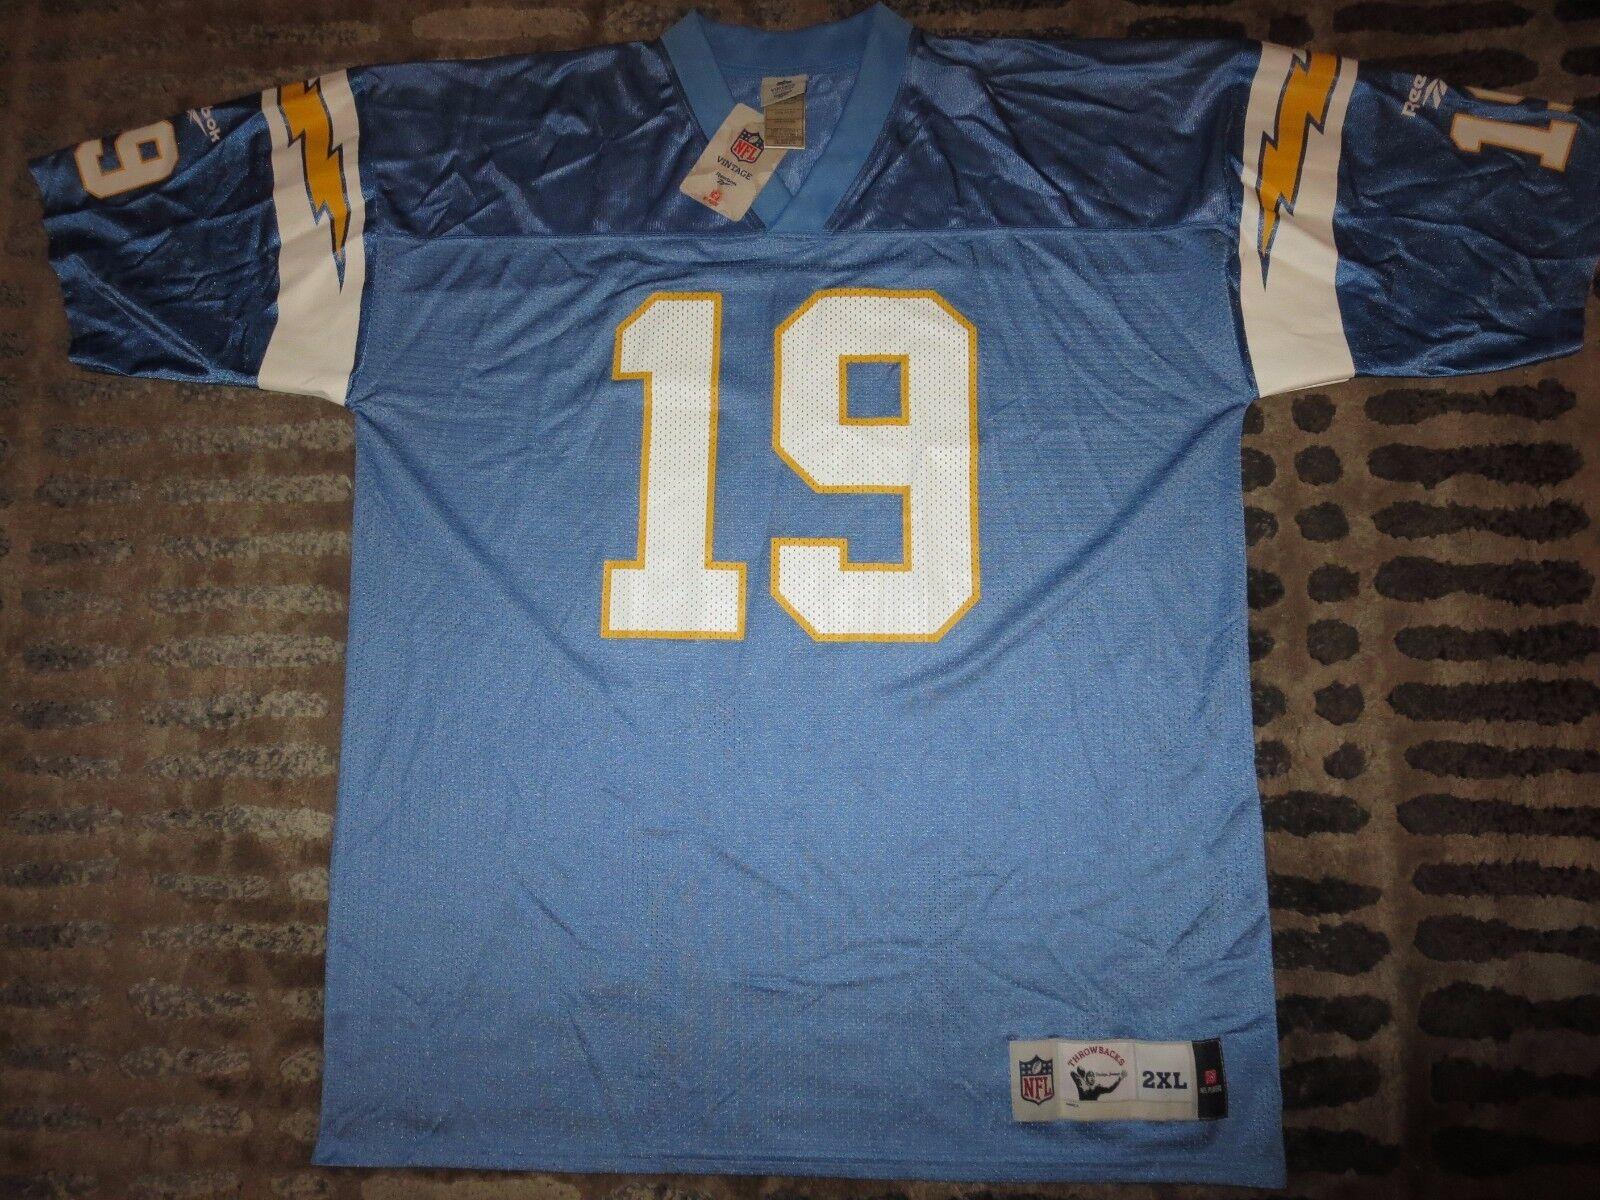 Lanza Alworth  19 San Diego Chargers Fútbol Reebok NFL Camiseta 2XL 2x Nuevo